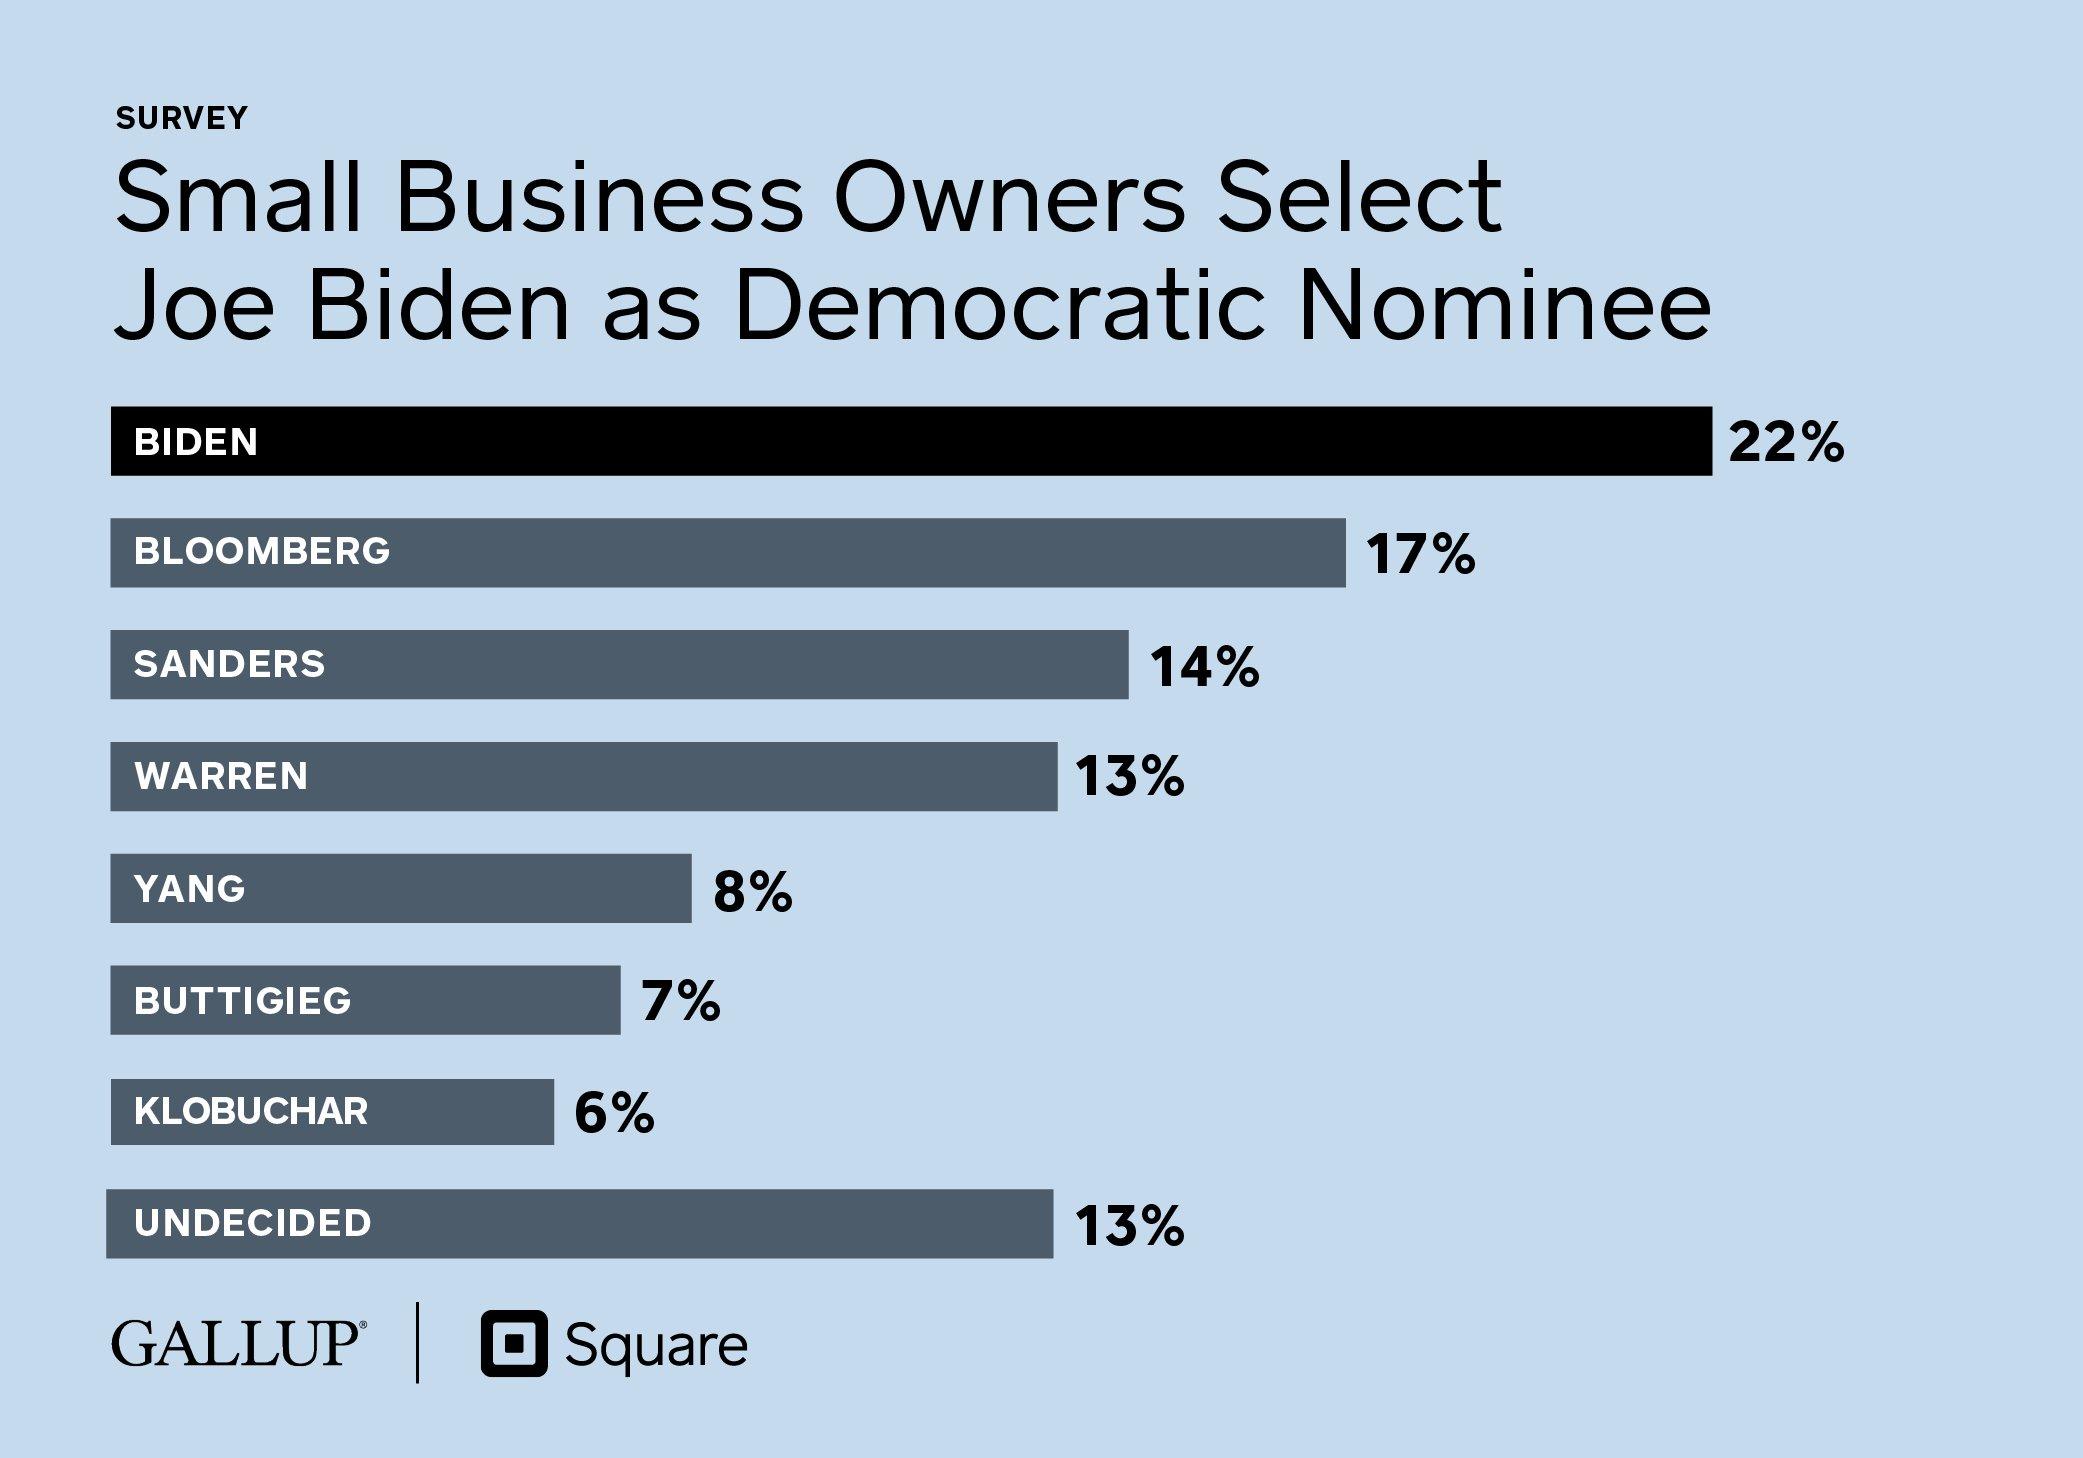 SMBs Select Biden as Democratic Nominee